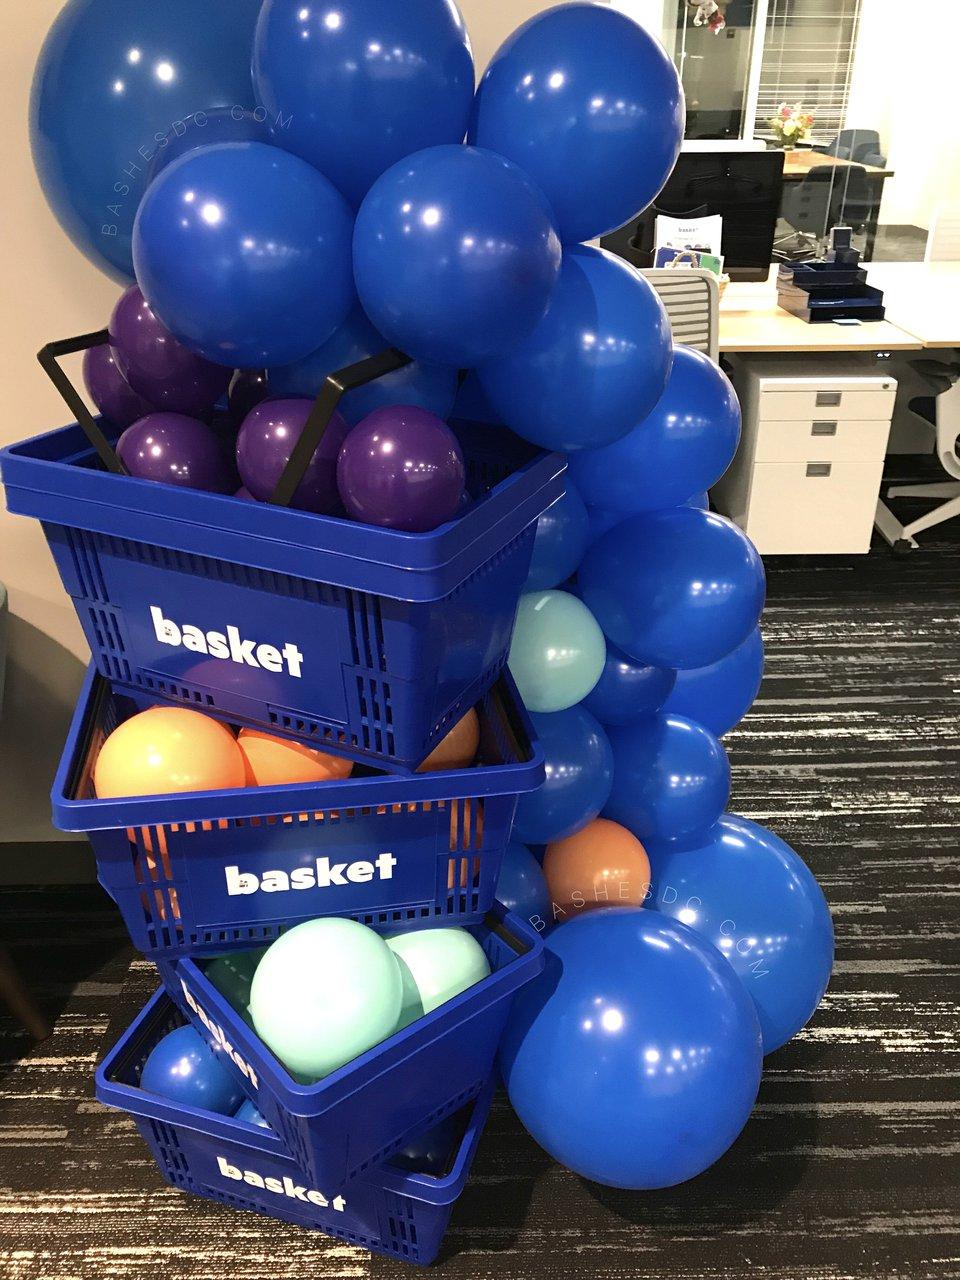 Basket App - HQ Opening Celebration  photo 85B5FC2E-DA55-48D0-B3A8-78466BD01D7B.jpg